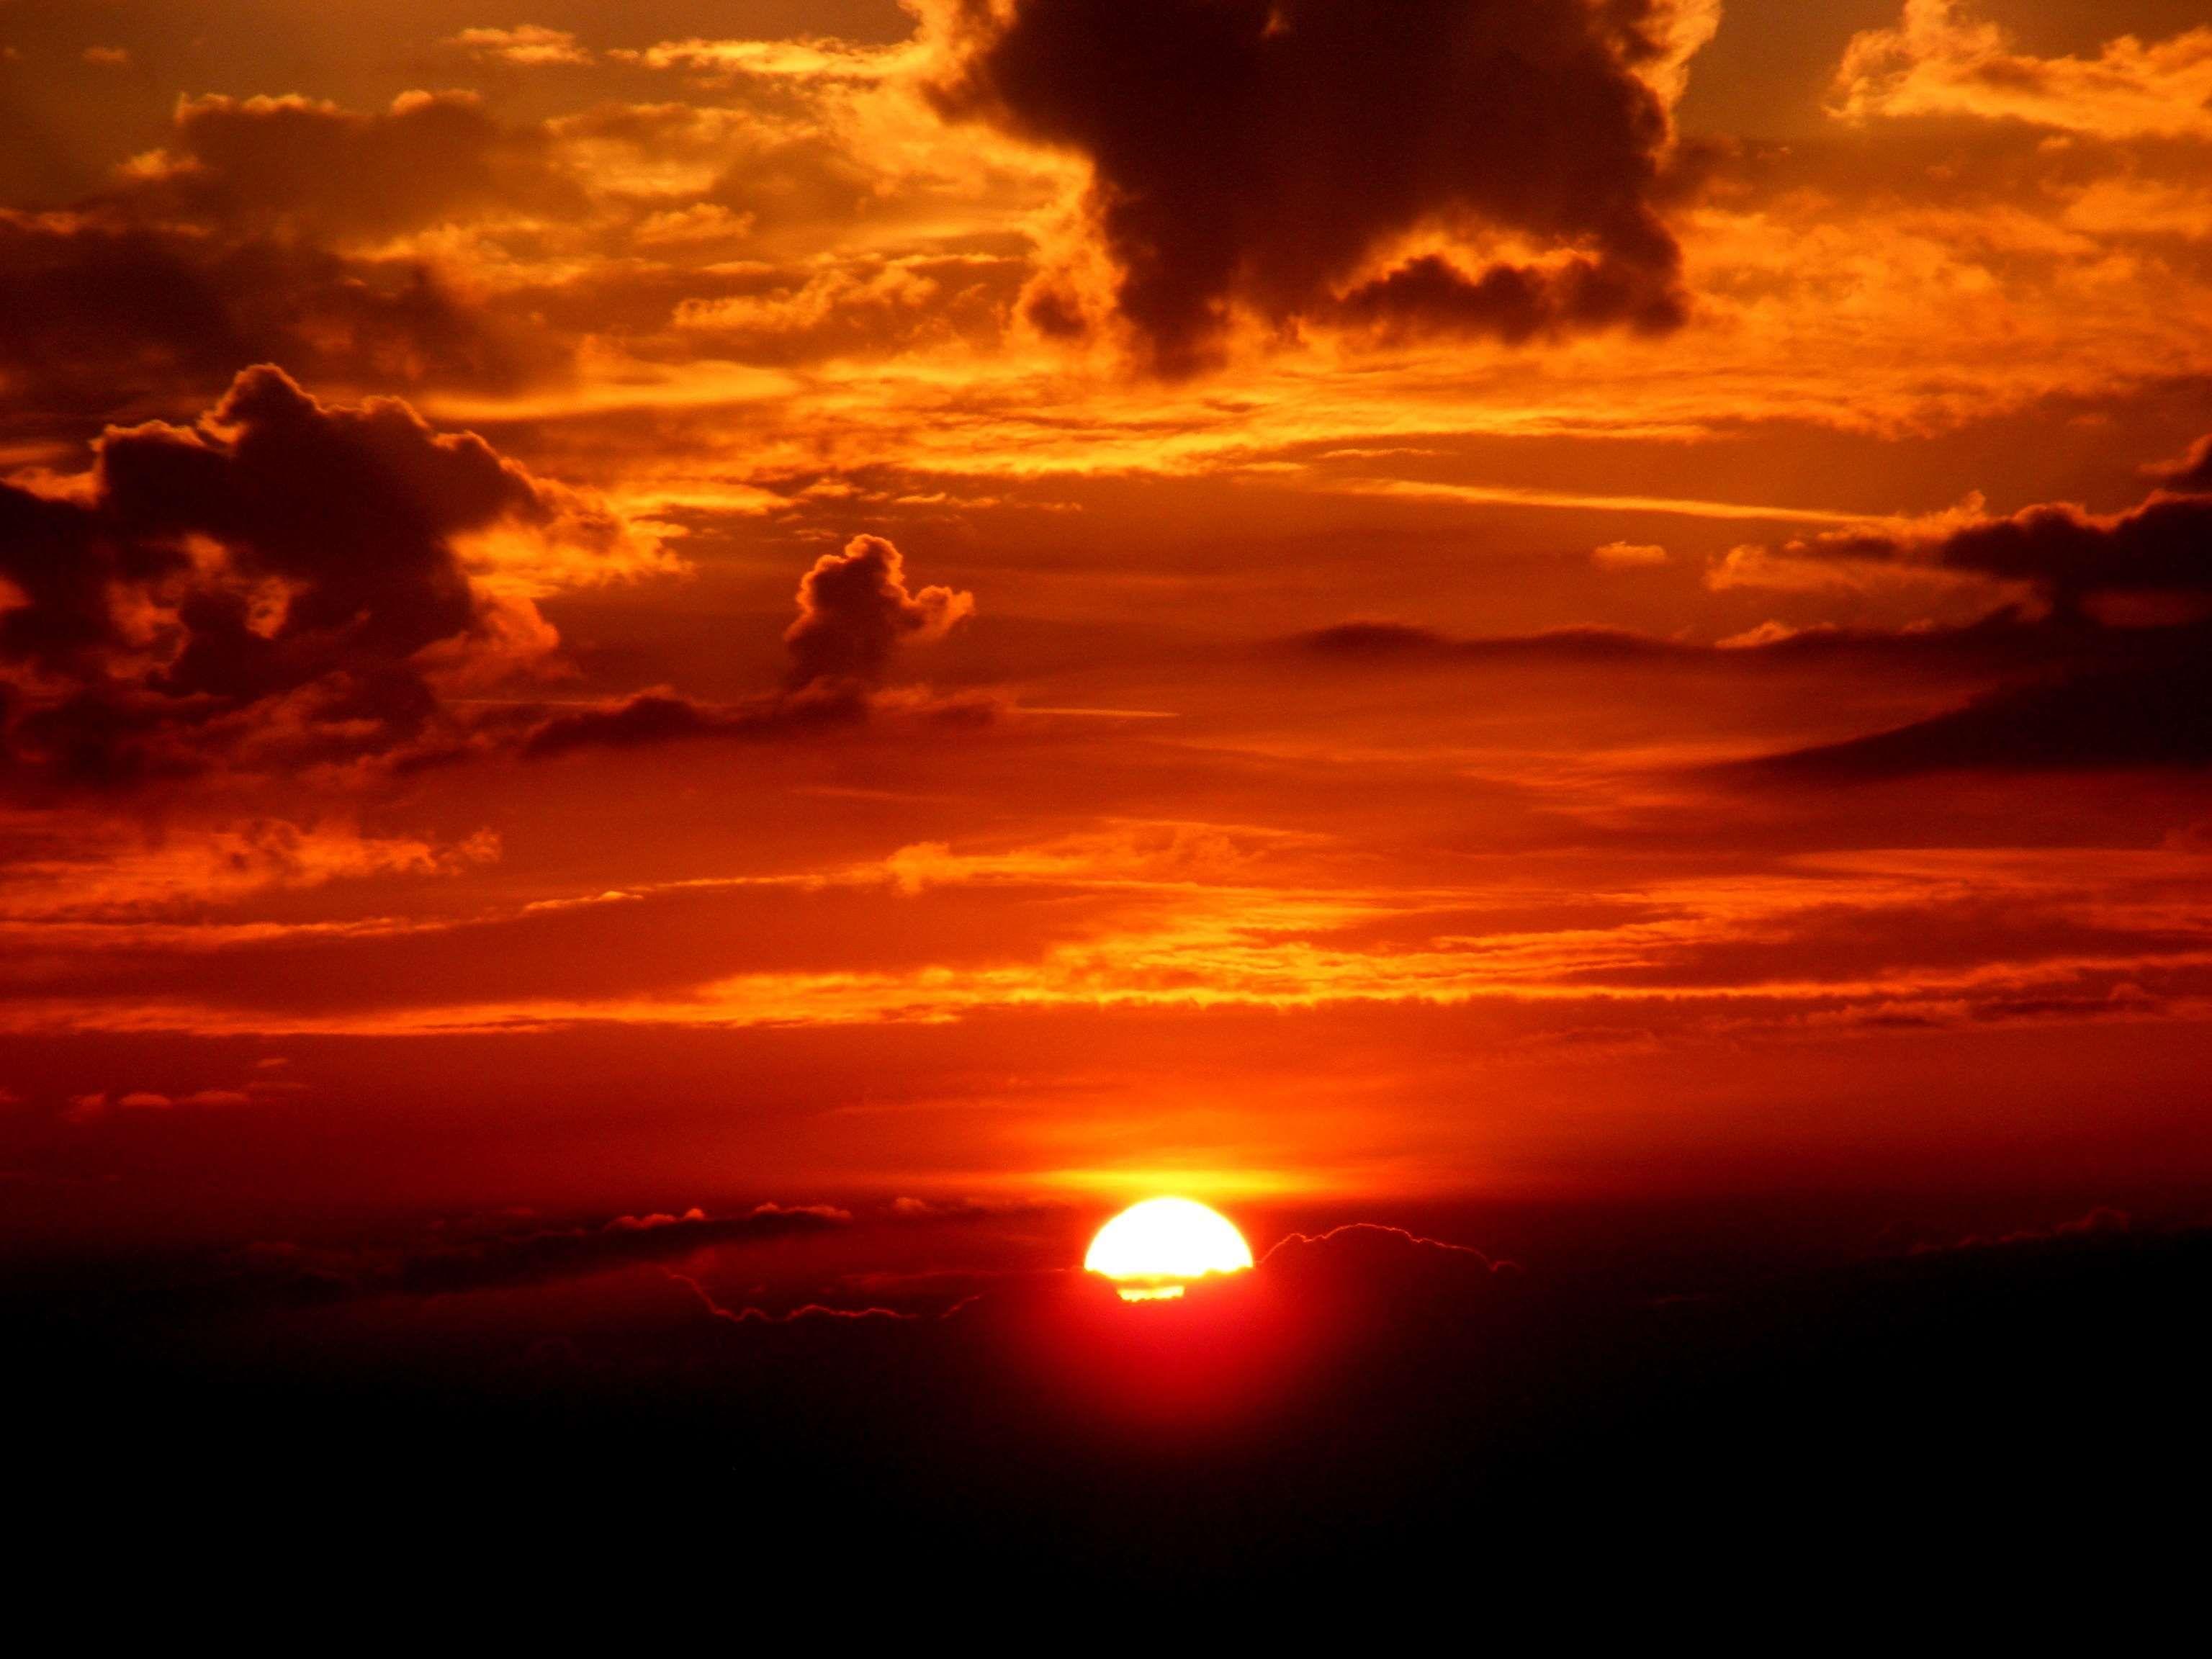 Cloud cloudy dusk evening sun horizon nature red sky sun cloud cloudy dusk evening sun horizon nature red thecheapjerseys Choice Image